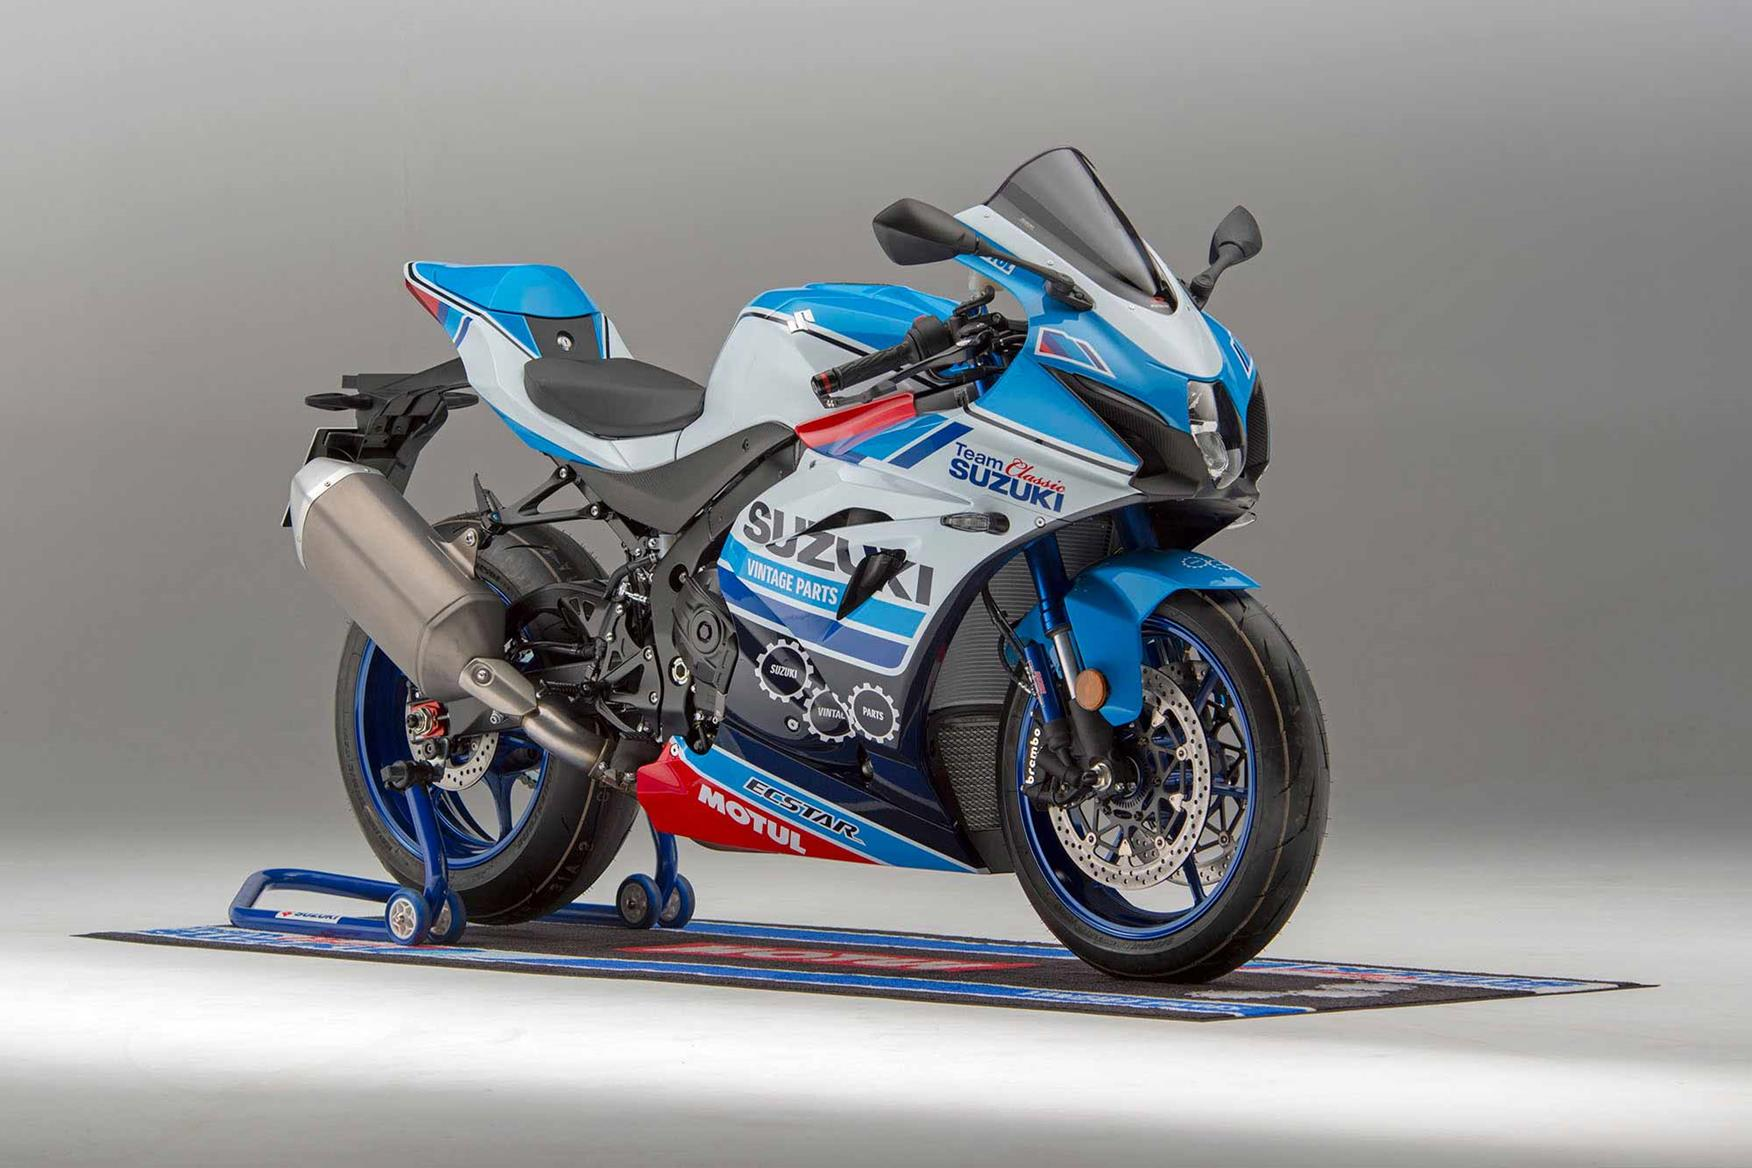 Matt Gold Motorrad Motorradfelge Decal Accessory Aufkleber f/ür Suzuki GSXS 1000